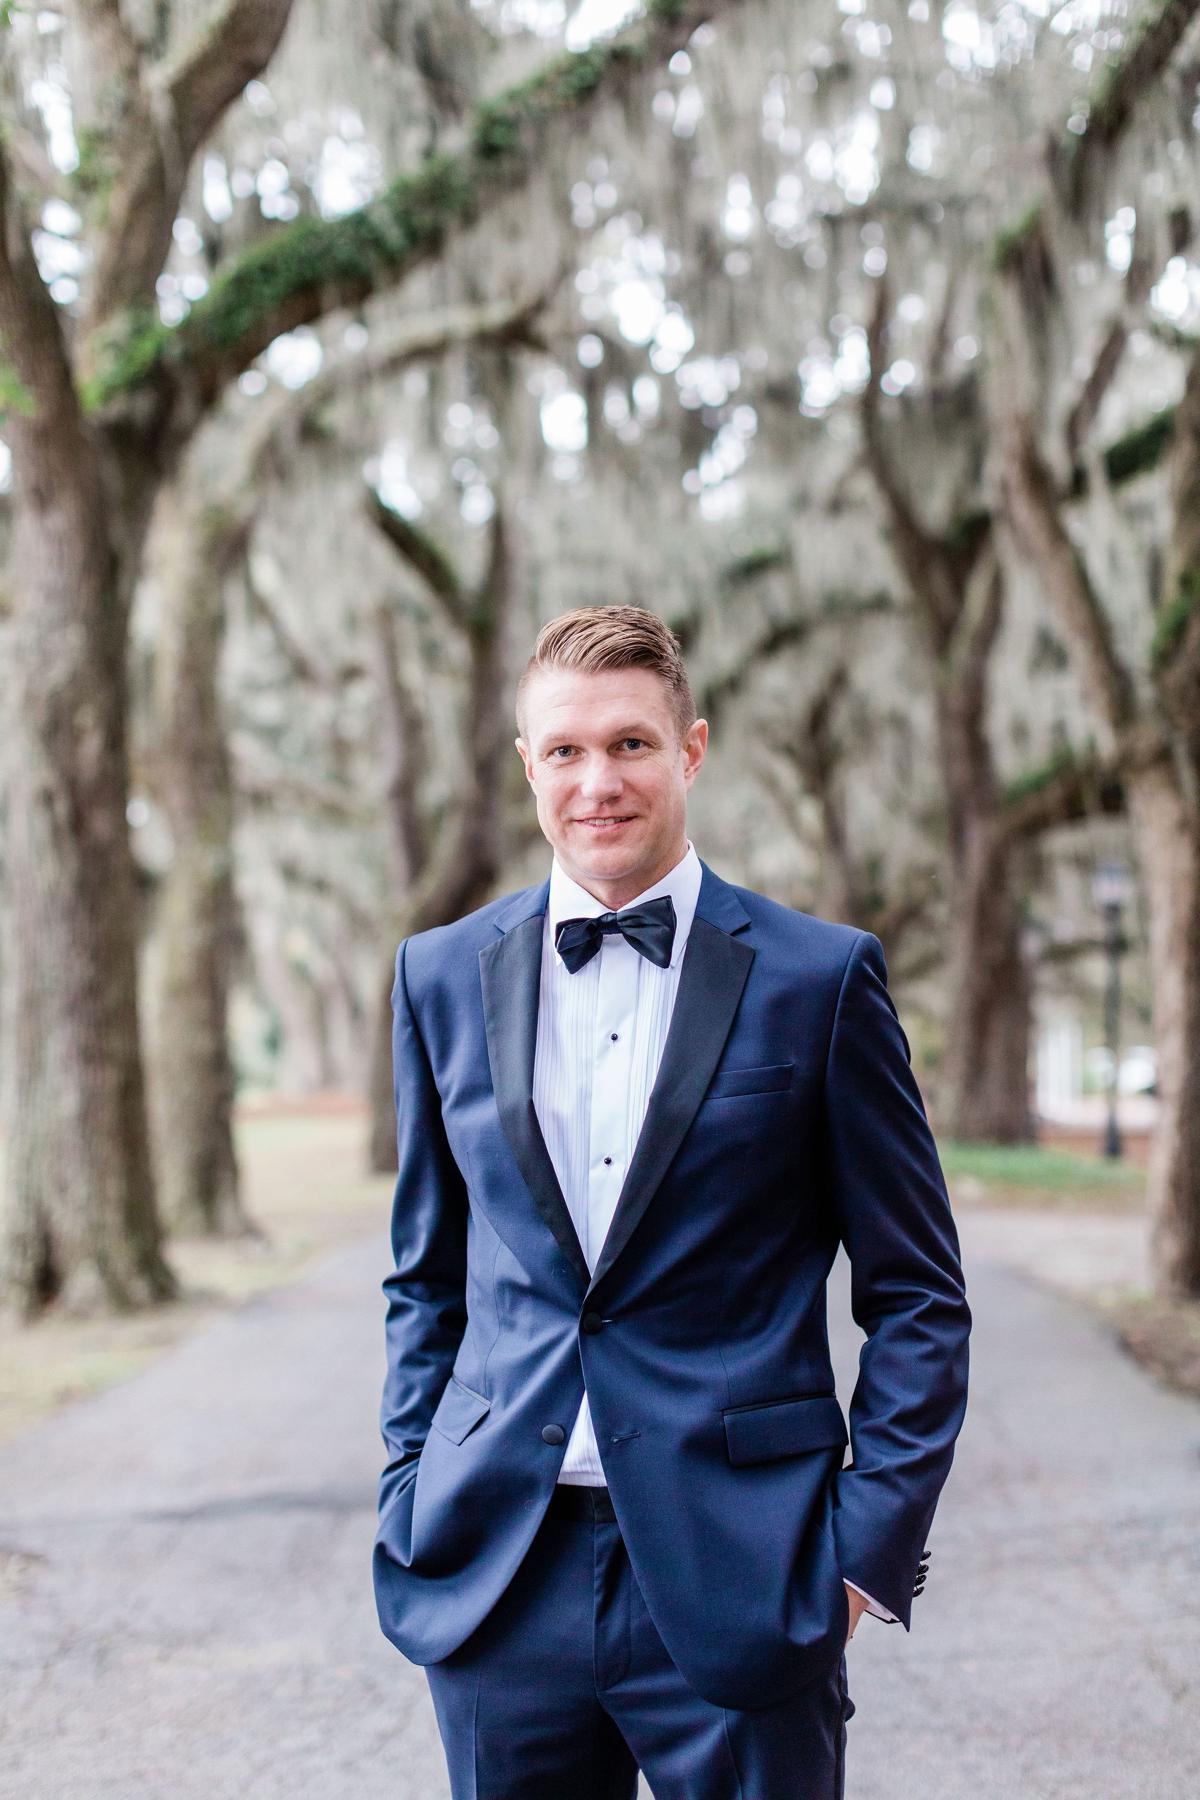 Blue grooms suit with black bowtie - Intimate Savannah Elopement